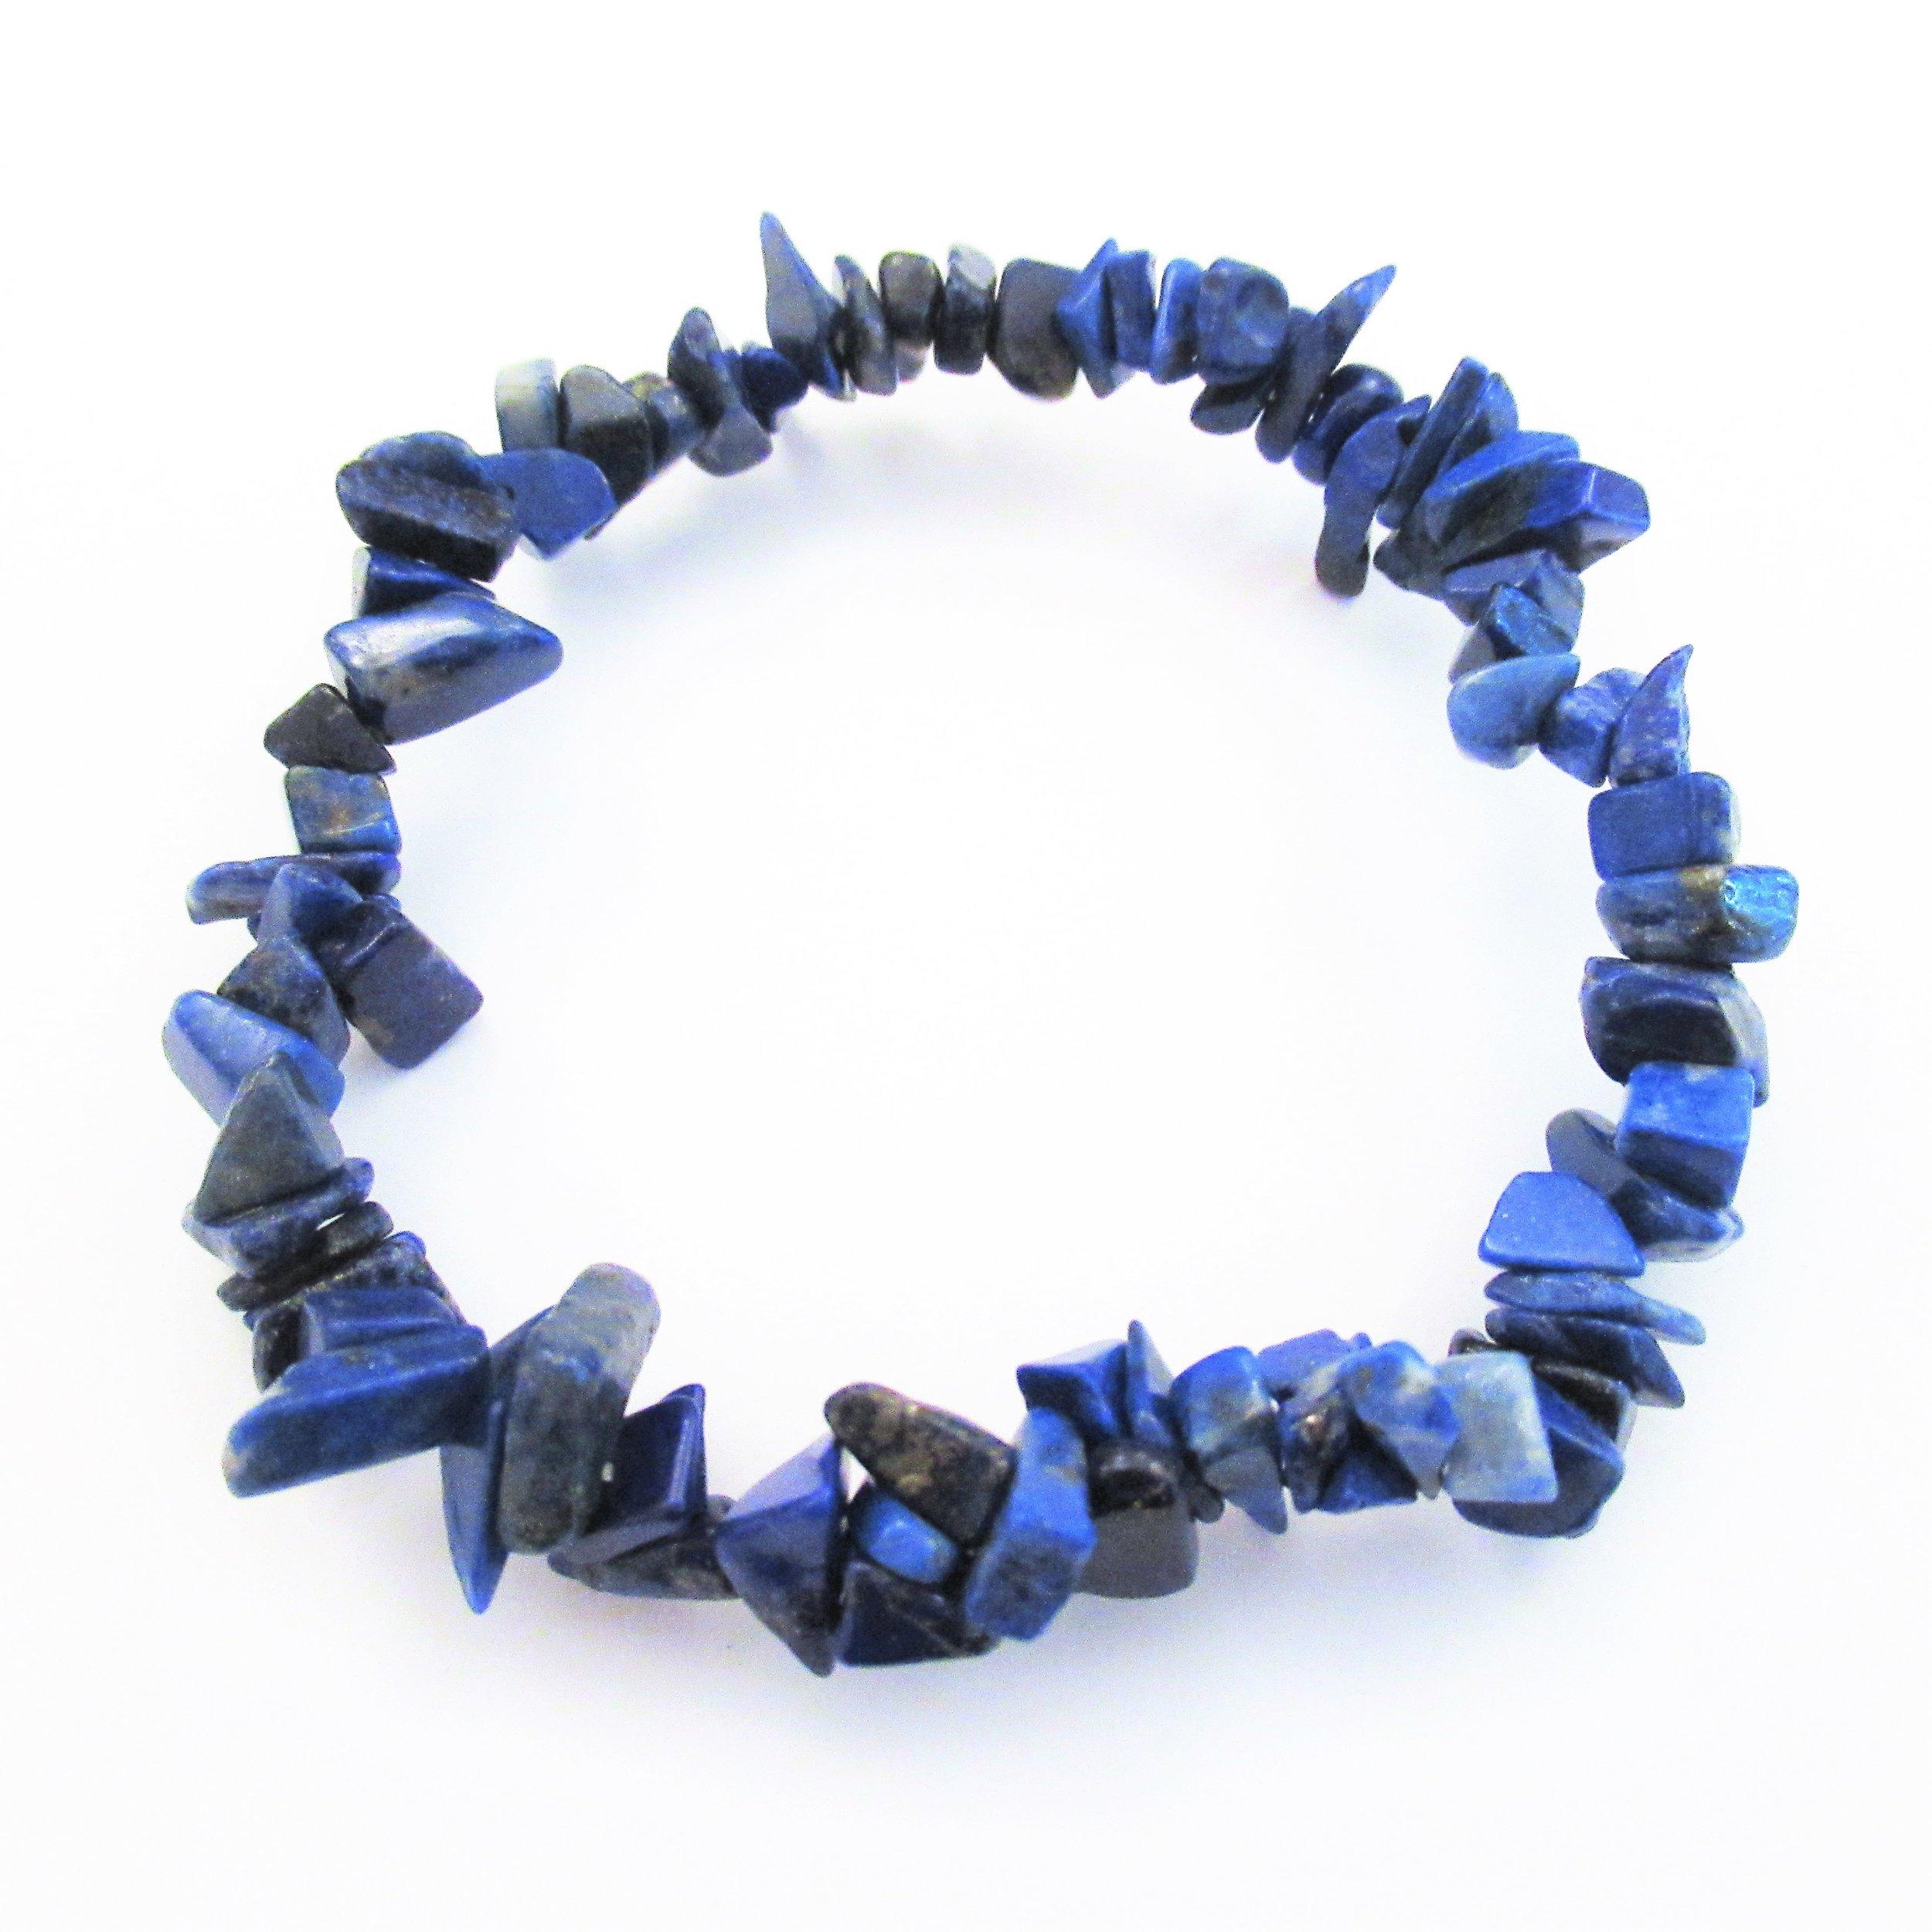 Gemstone Jewellery - Bracelets, Pendants, Necklaces